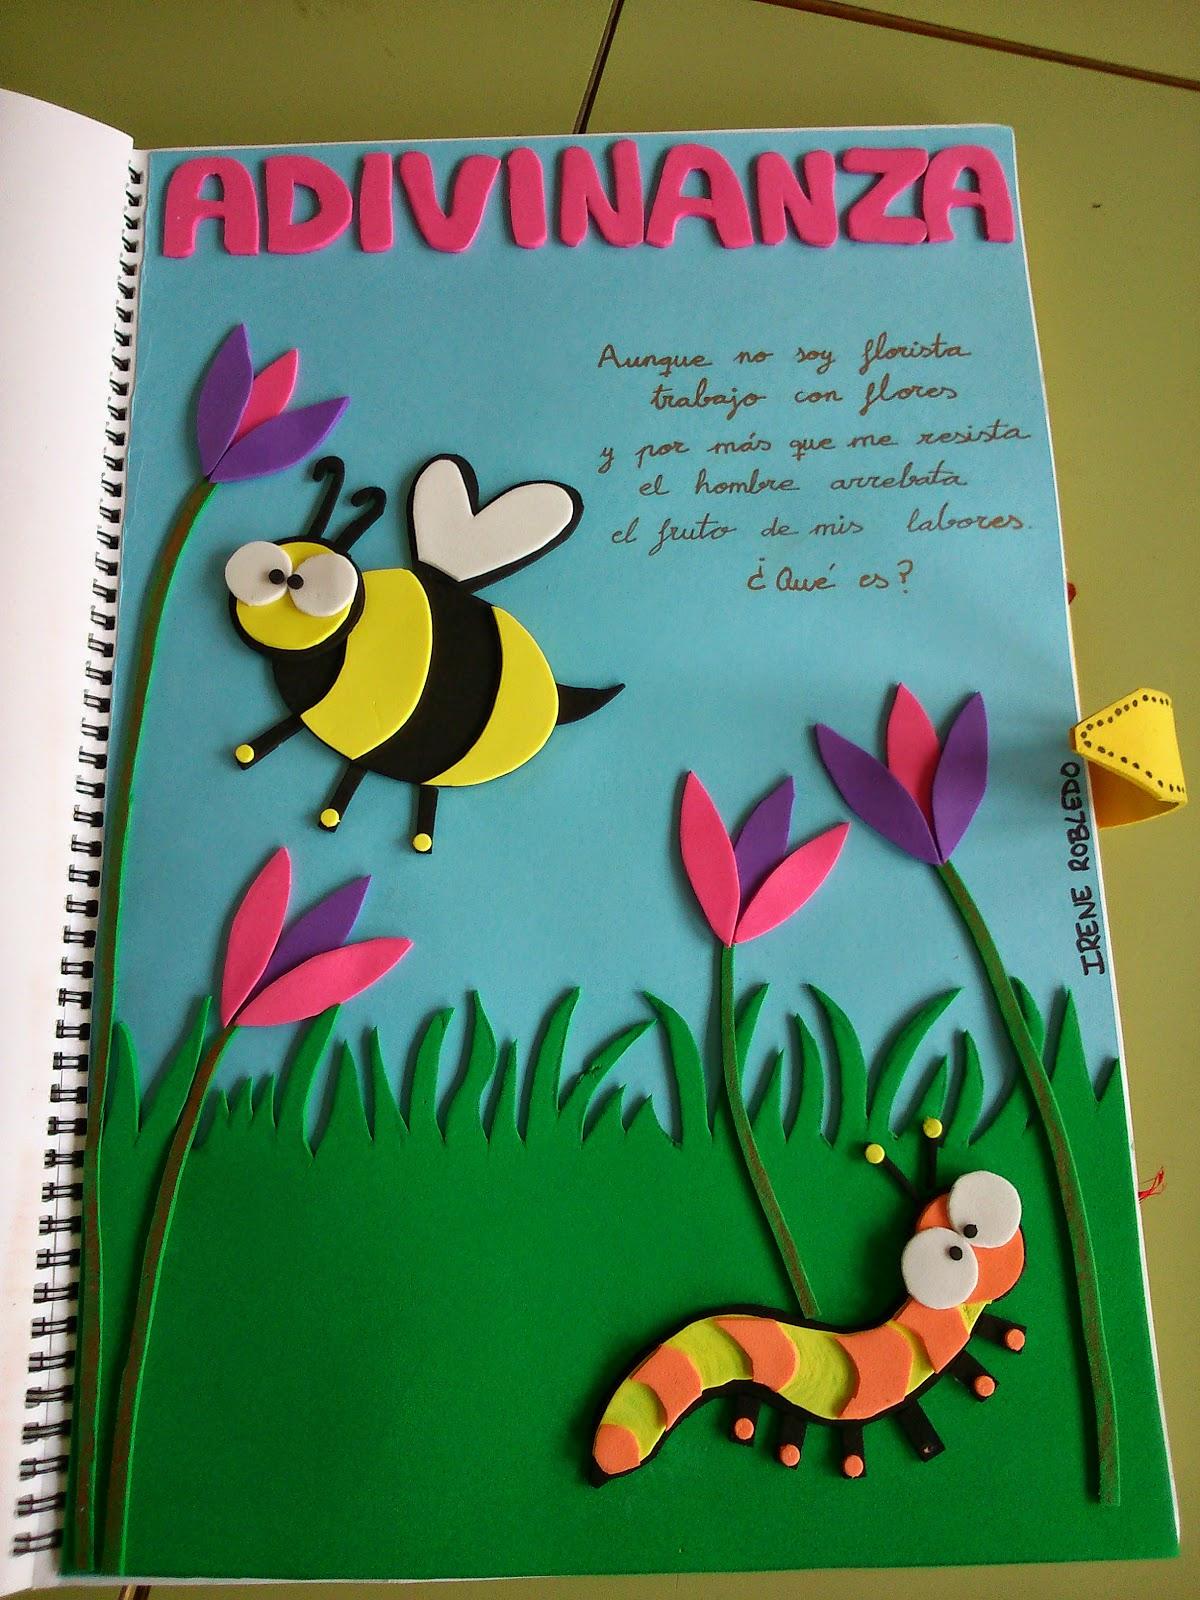 Club de ideas libro viajero la eduteca - Como decorar un sobre ...